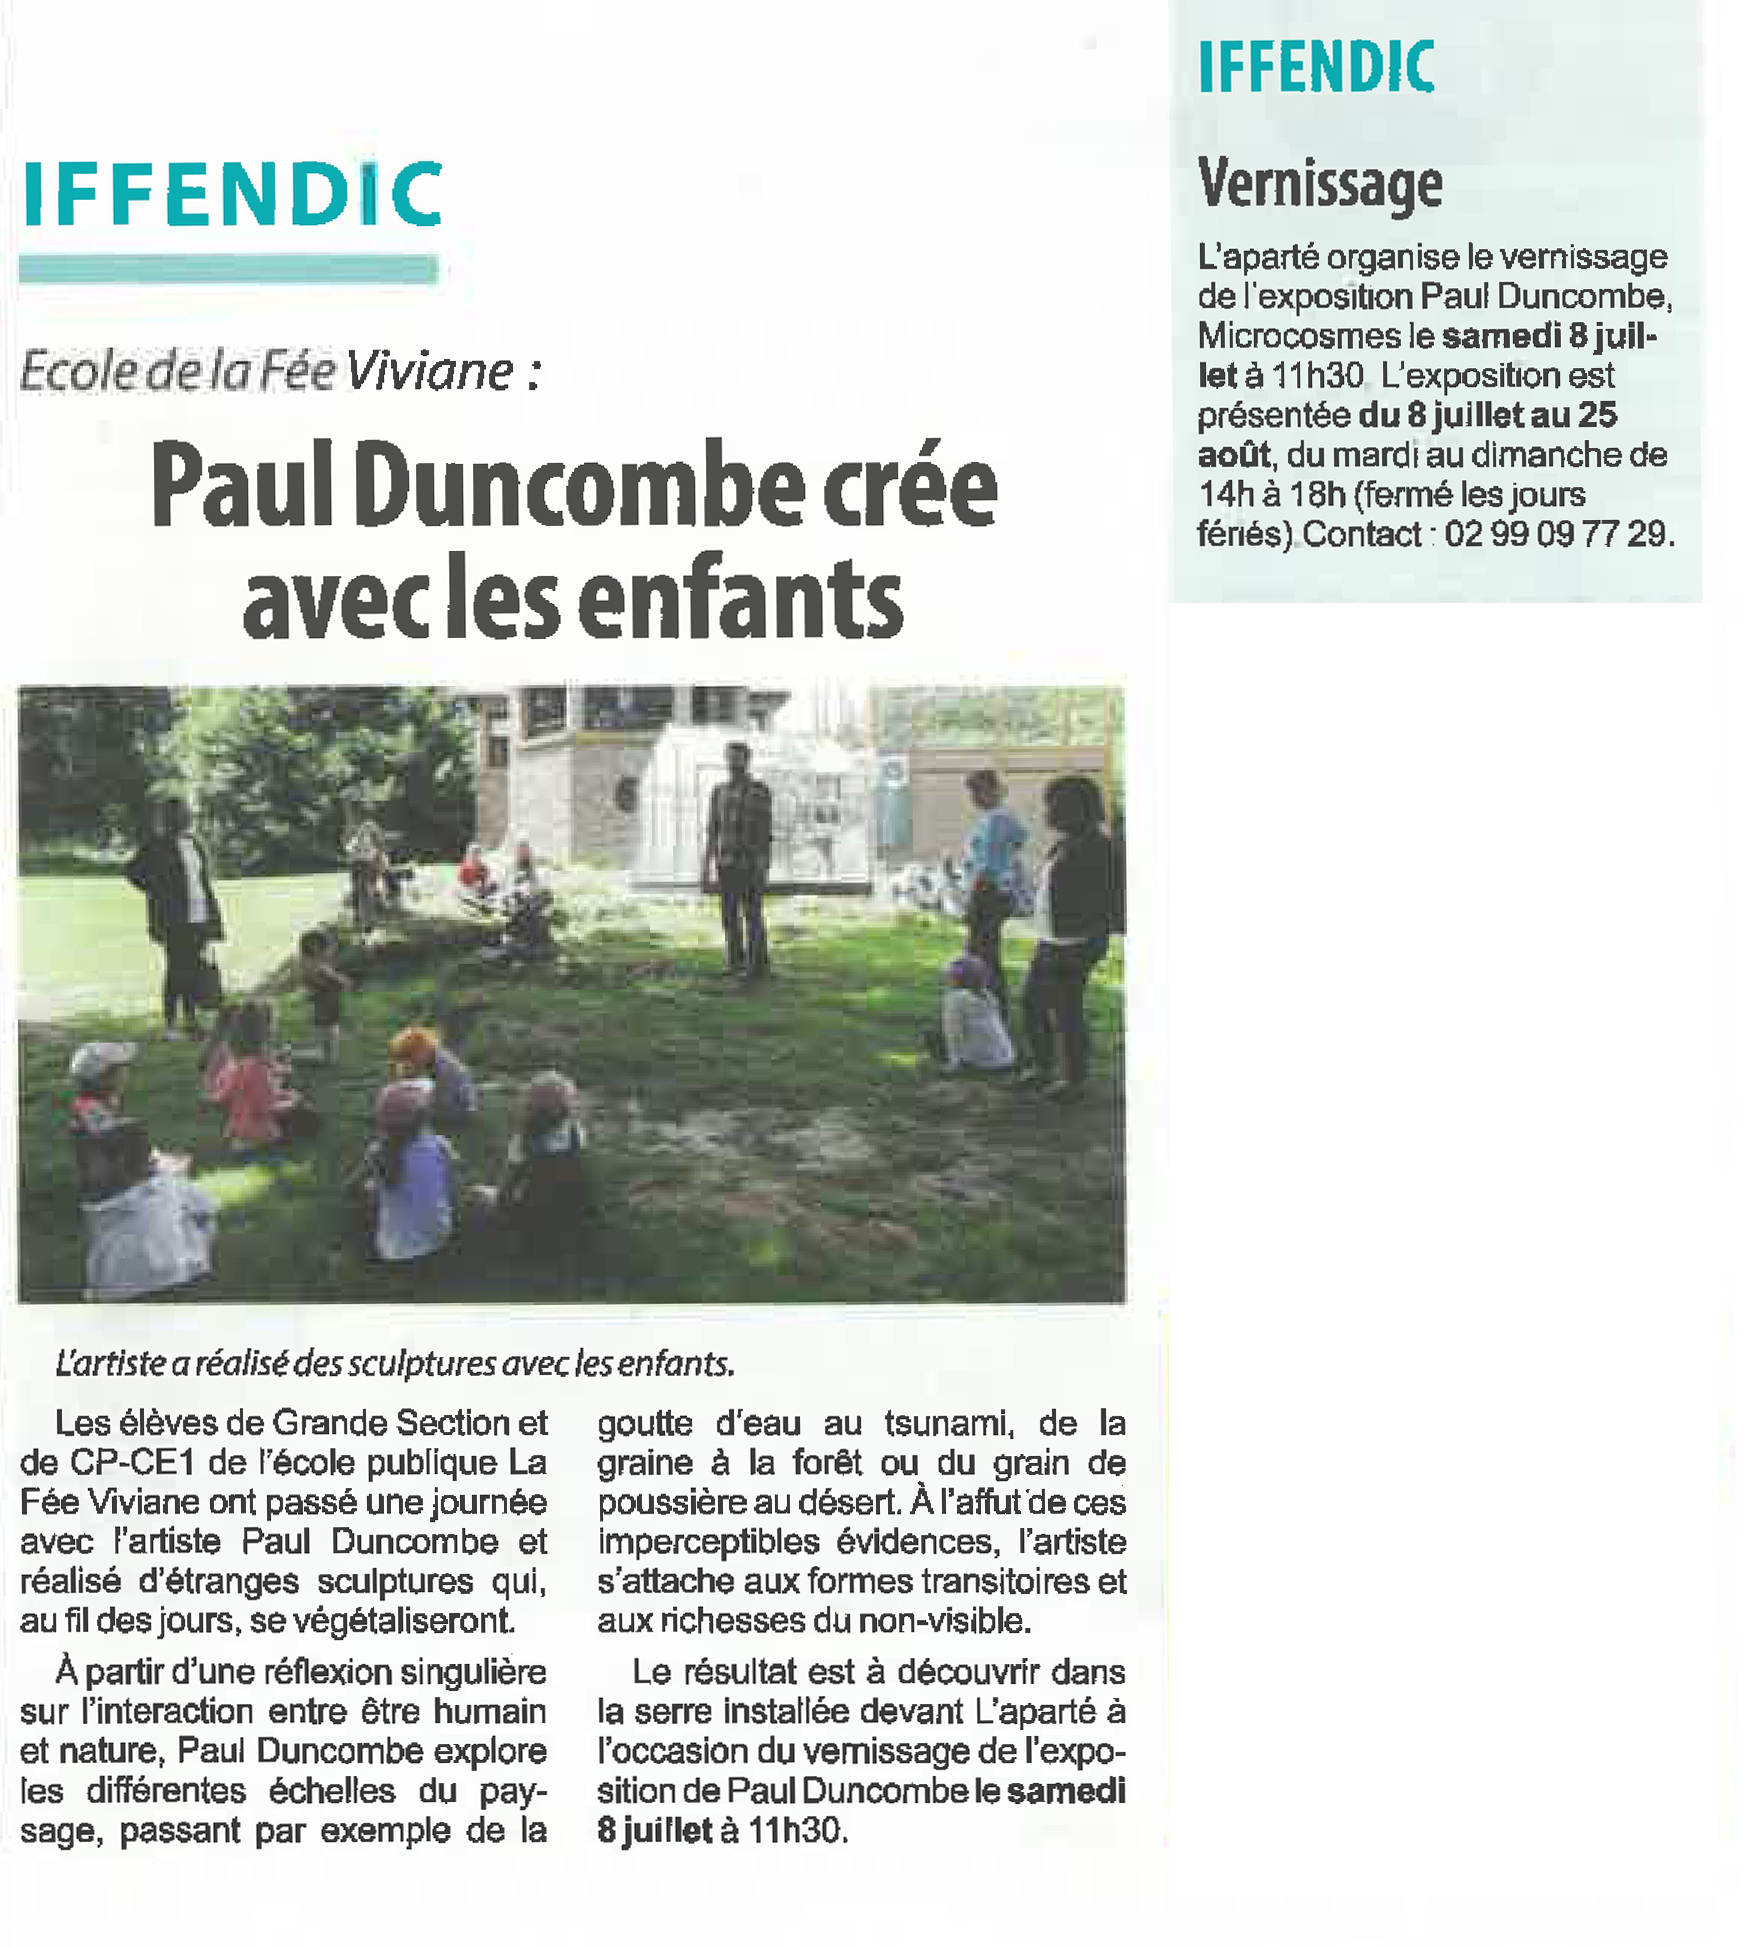 Hebdomadaire d'Armor du 7 juillet 2017